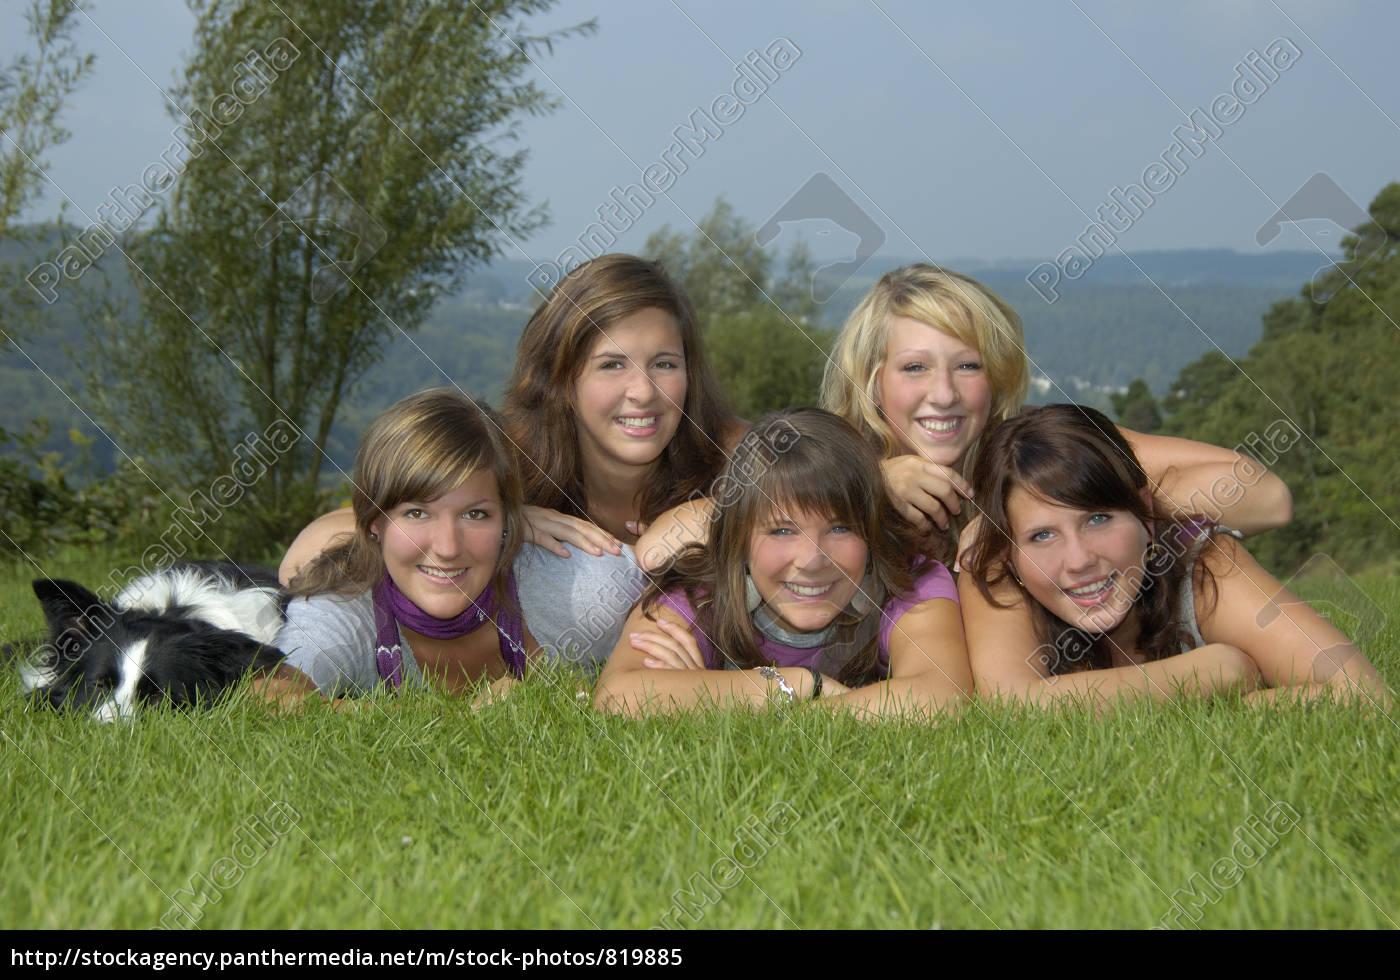 girlfriends - 819885